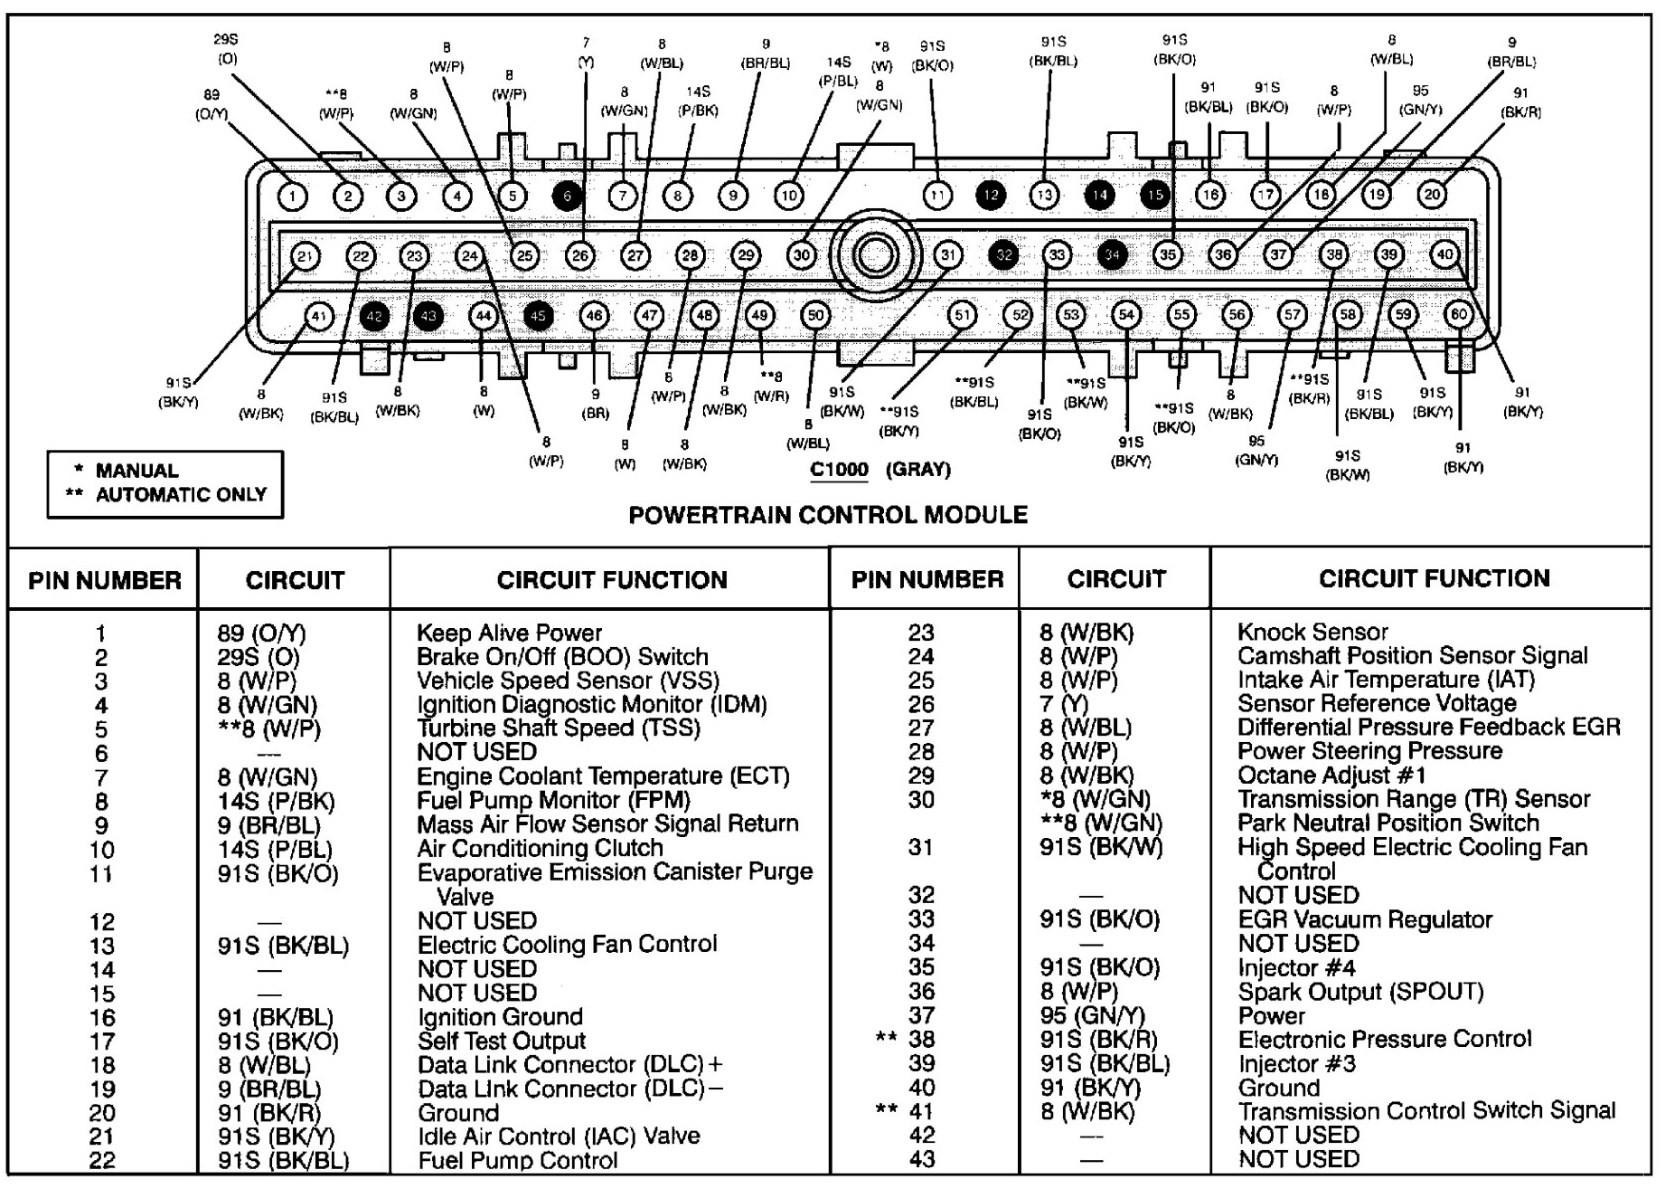 wiring diagram 2004 mercury grand marquis custom wiring diagram u2022 rh coastalcay co 2003 Mercury Marquis Wiring Diagram 2003 Mercury Marquis Wiring Diagram